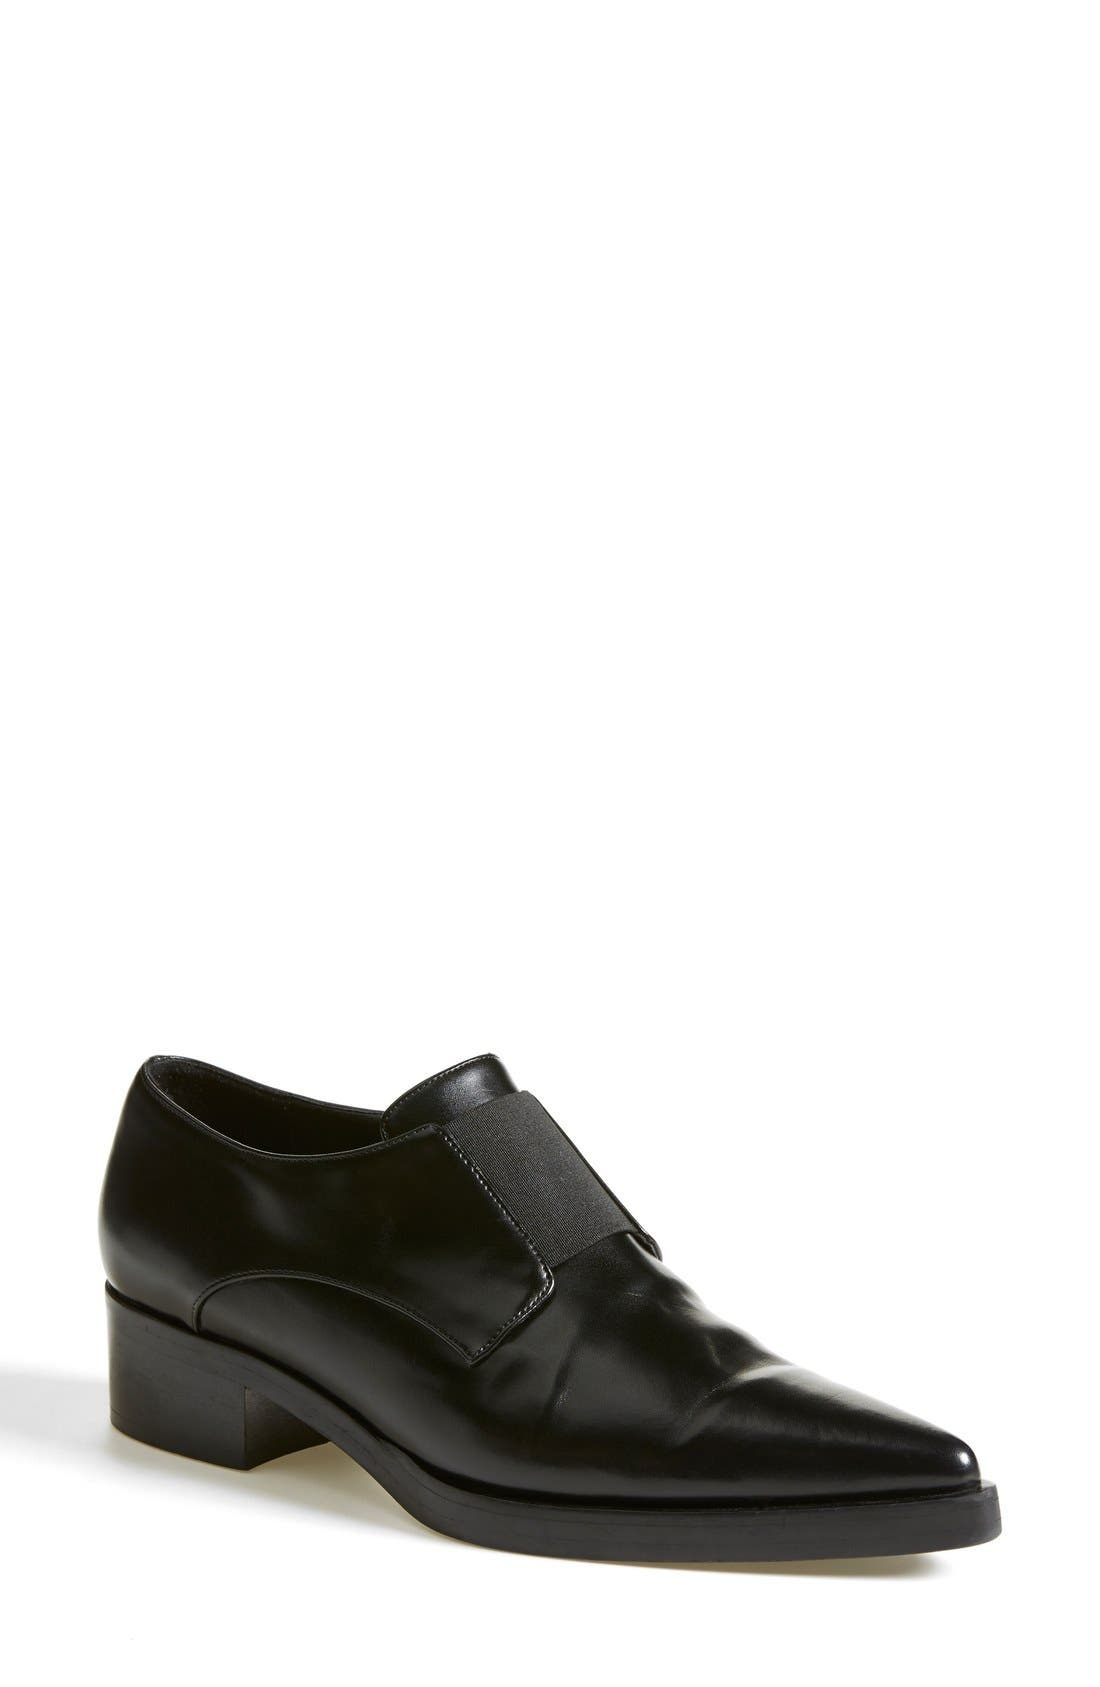 Alternate Image 1 Selected - Stella McCartney Pointy Toe Loafer Flat (Women)